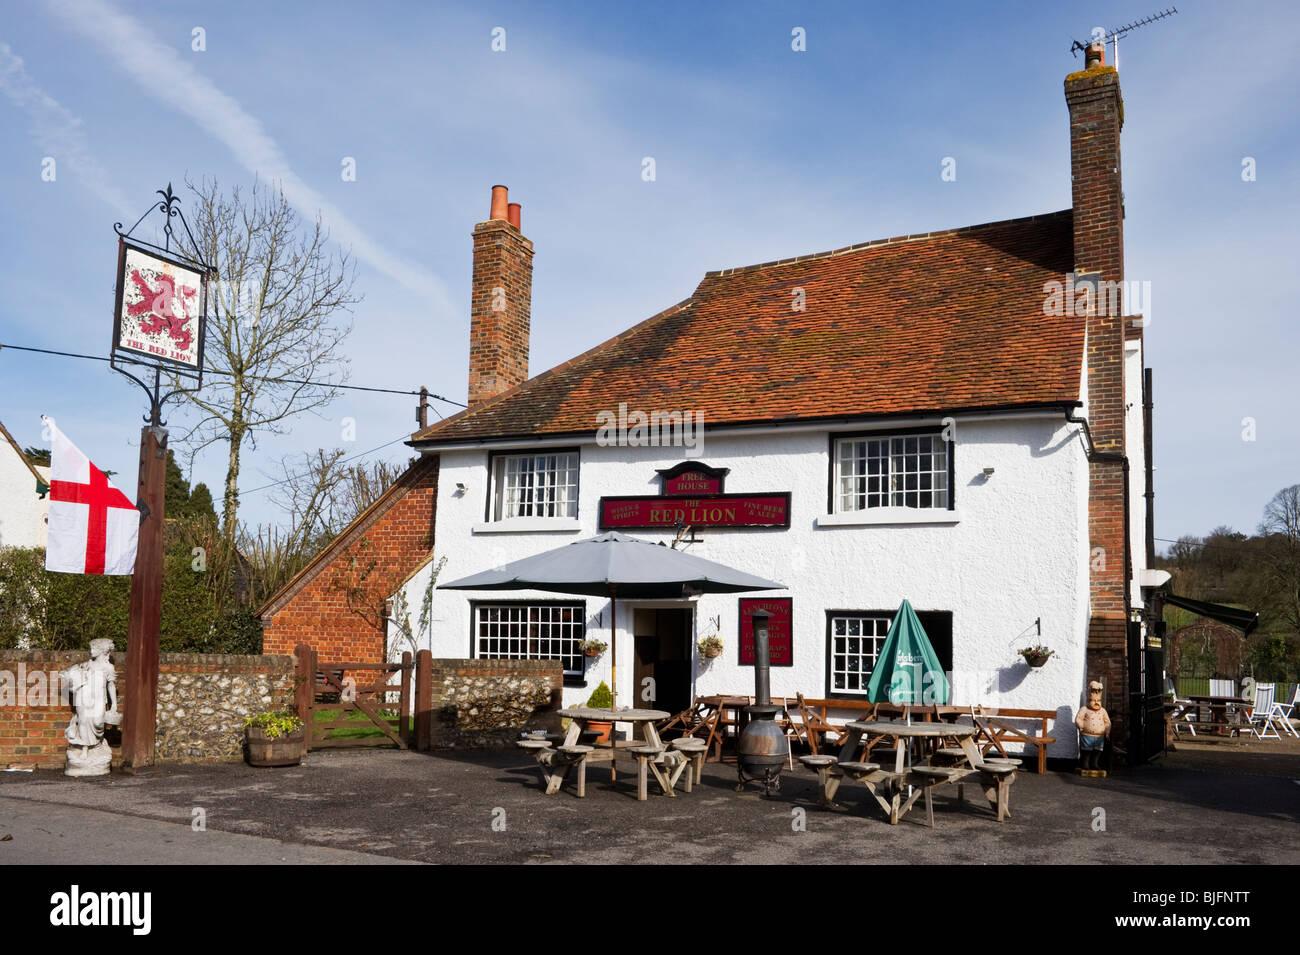 Red Lion public house at Little Missenden village Buckinghamshire UK - Stock Image